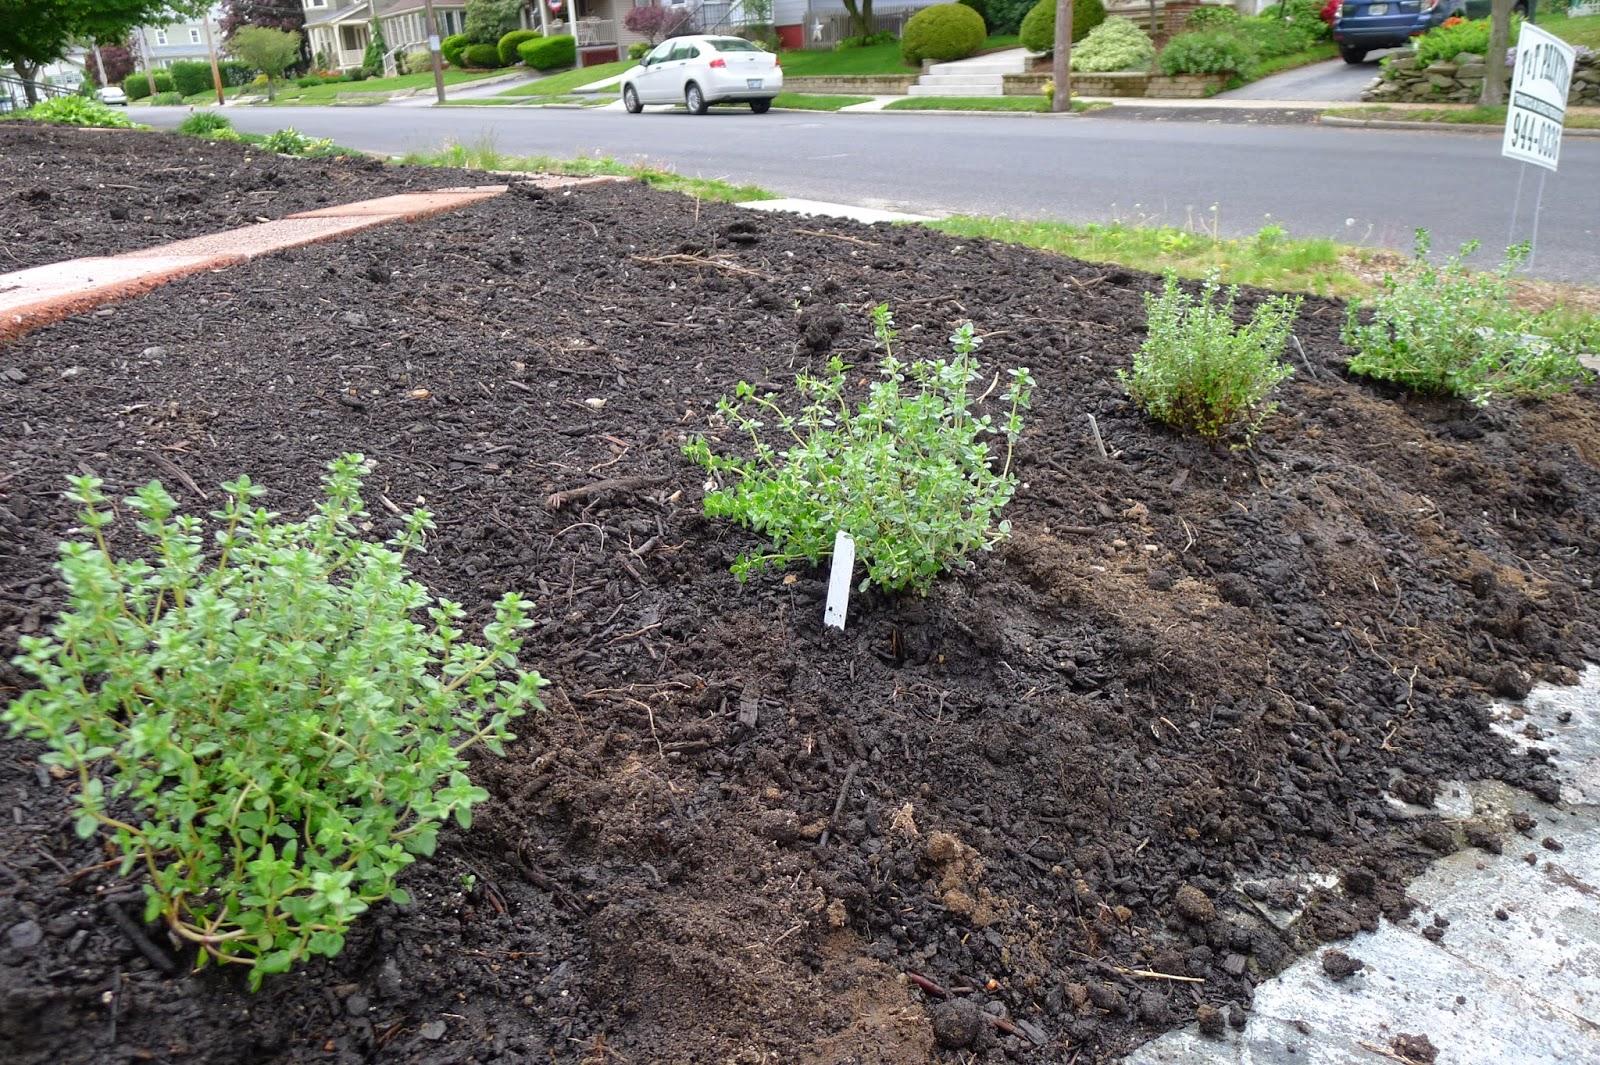 Soil erosion, thyme, edible landscaping